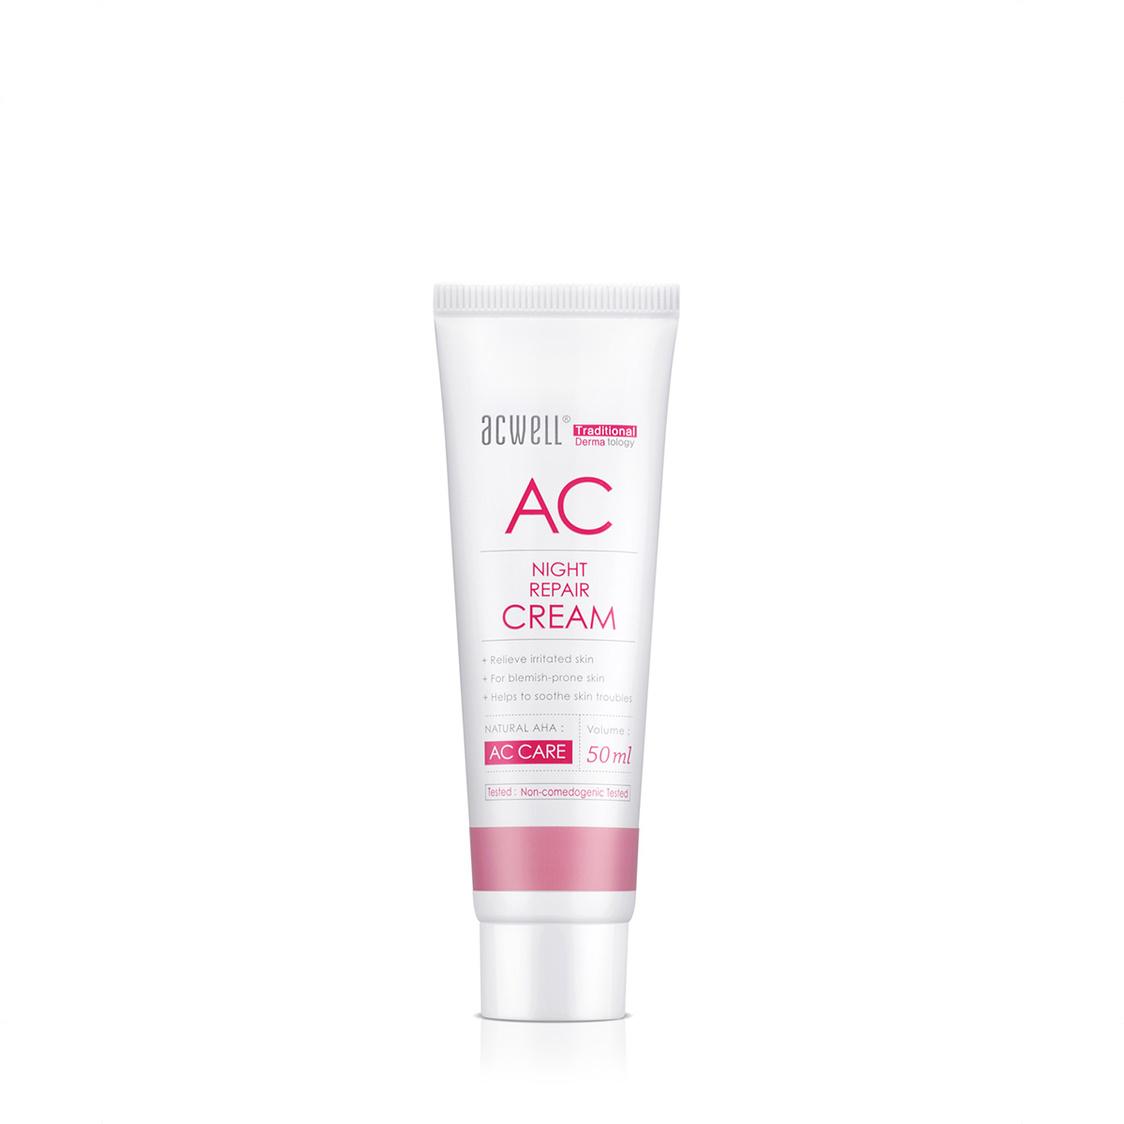 Acwell AC Night Repair Cream 50ml